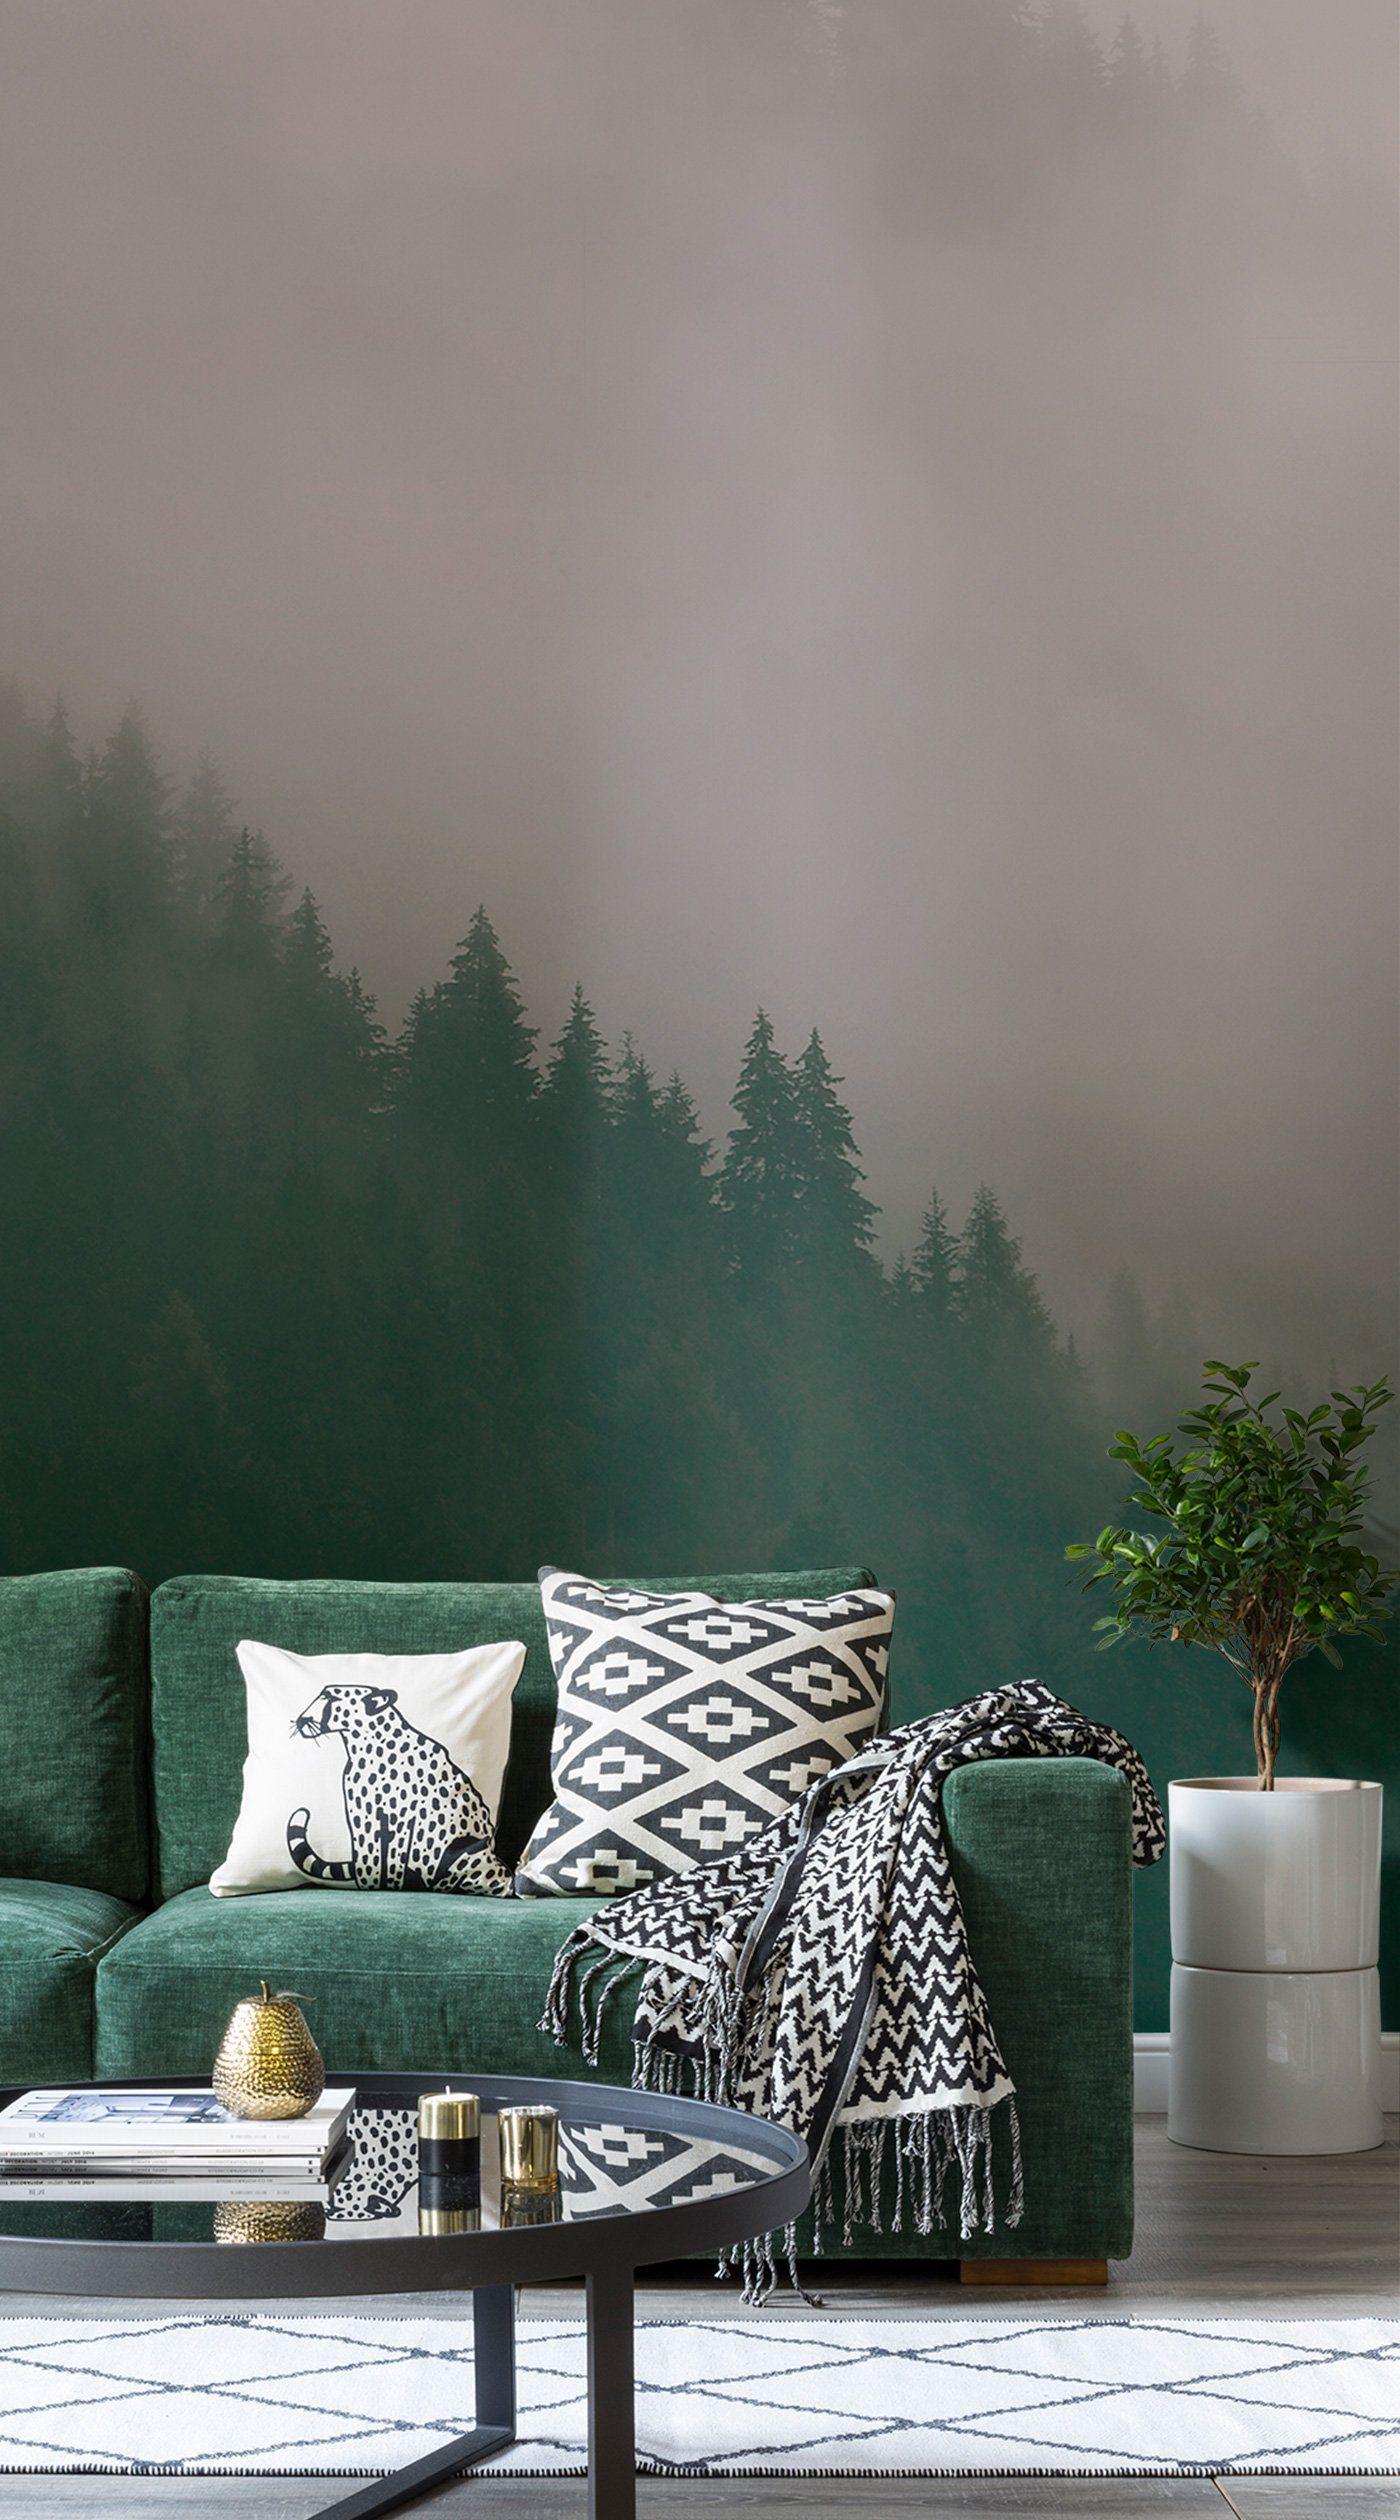 Tree Design Wallpaper Living Room: Living Room Green, Living Room